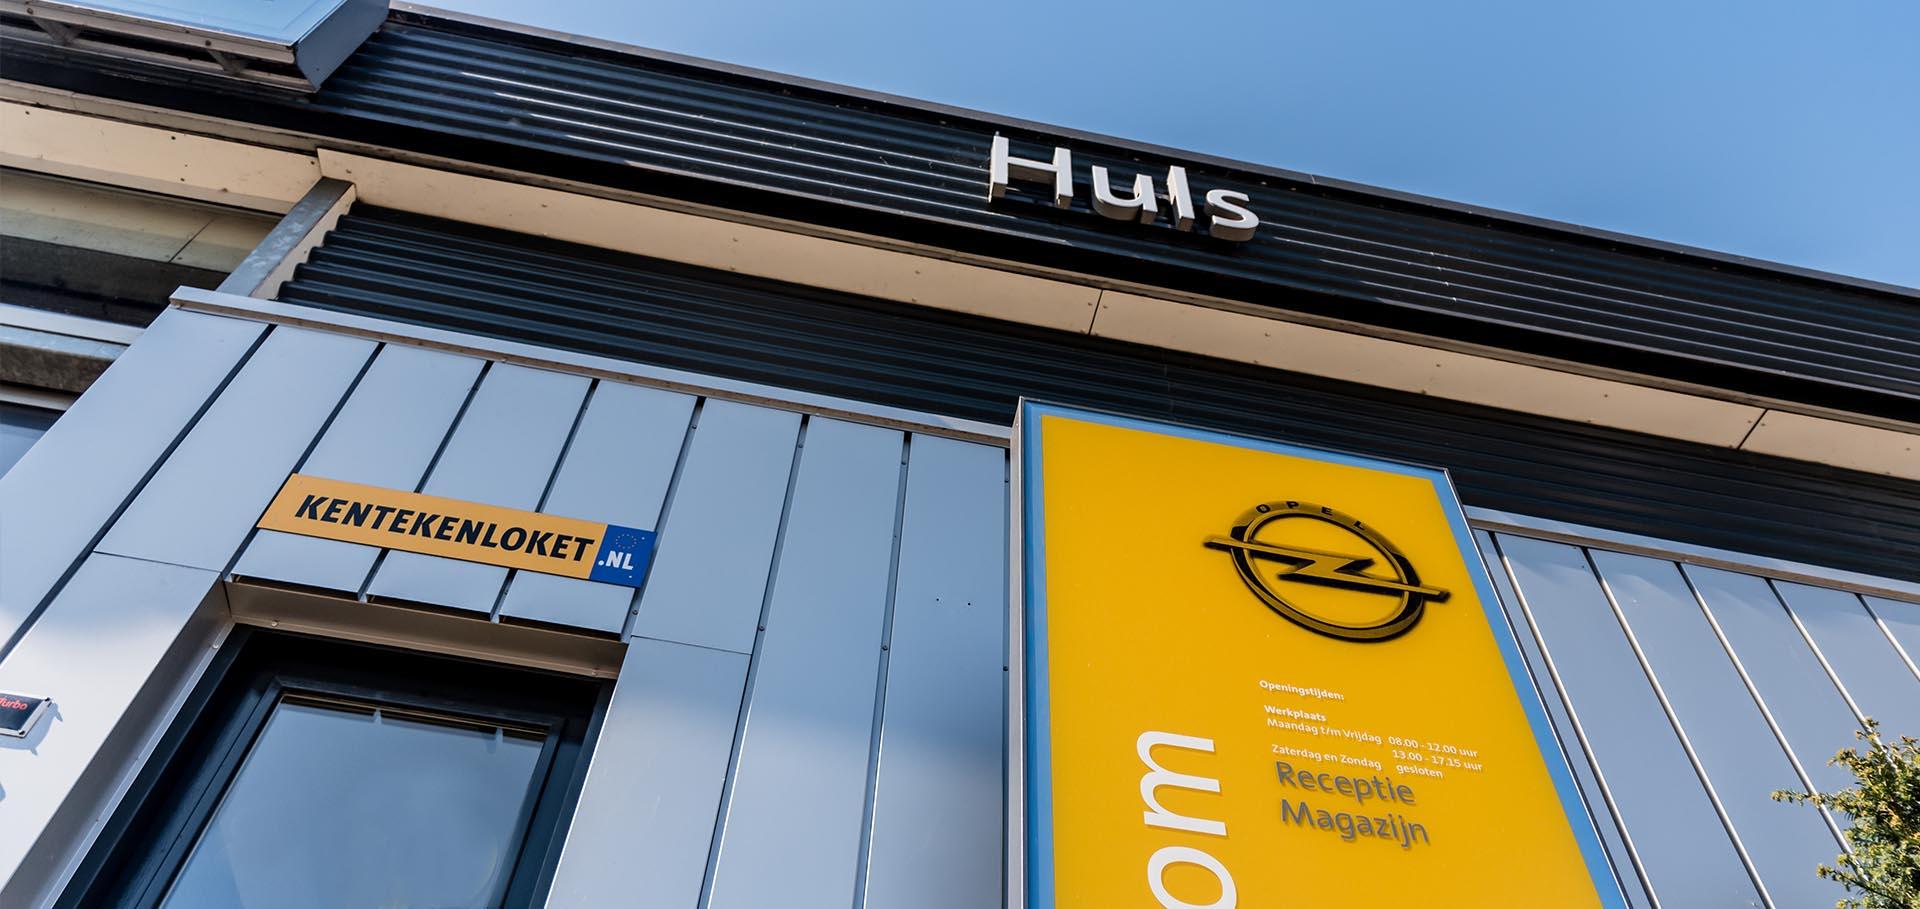 Kentekenloket autobedrijf Huls